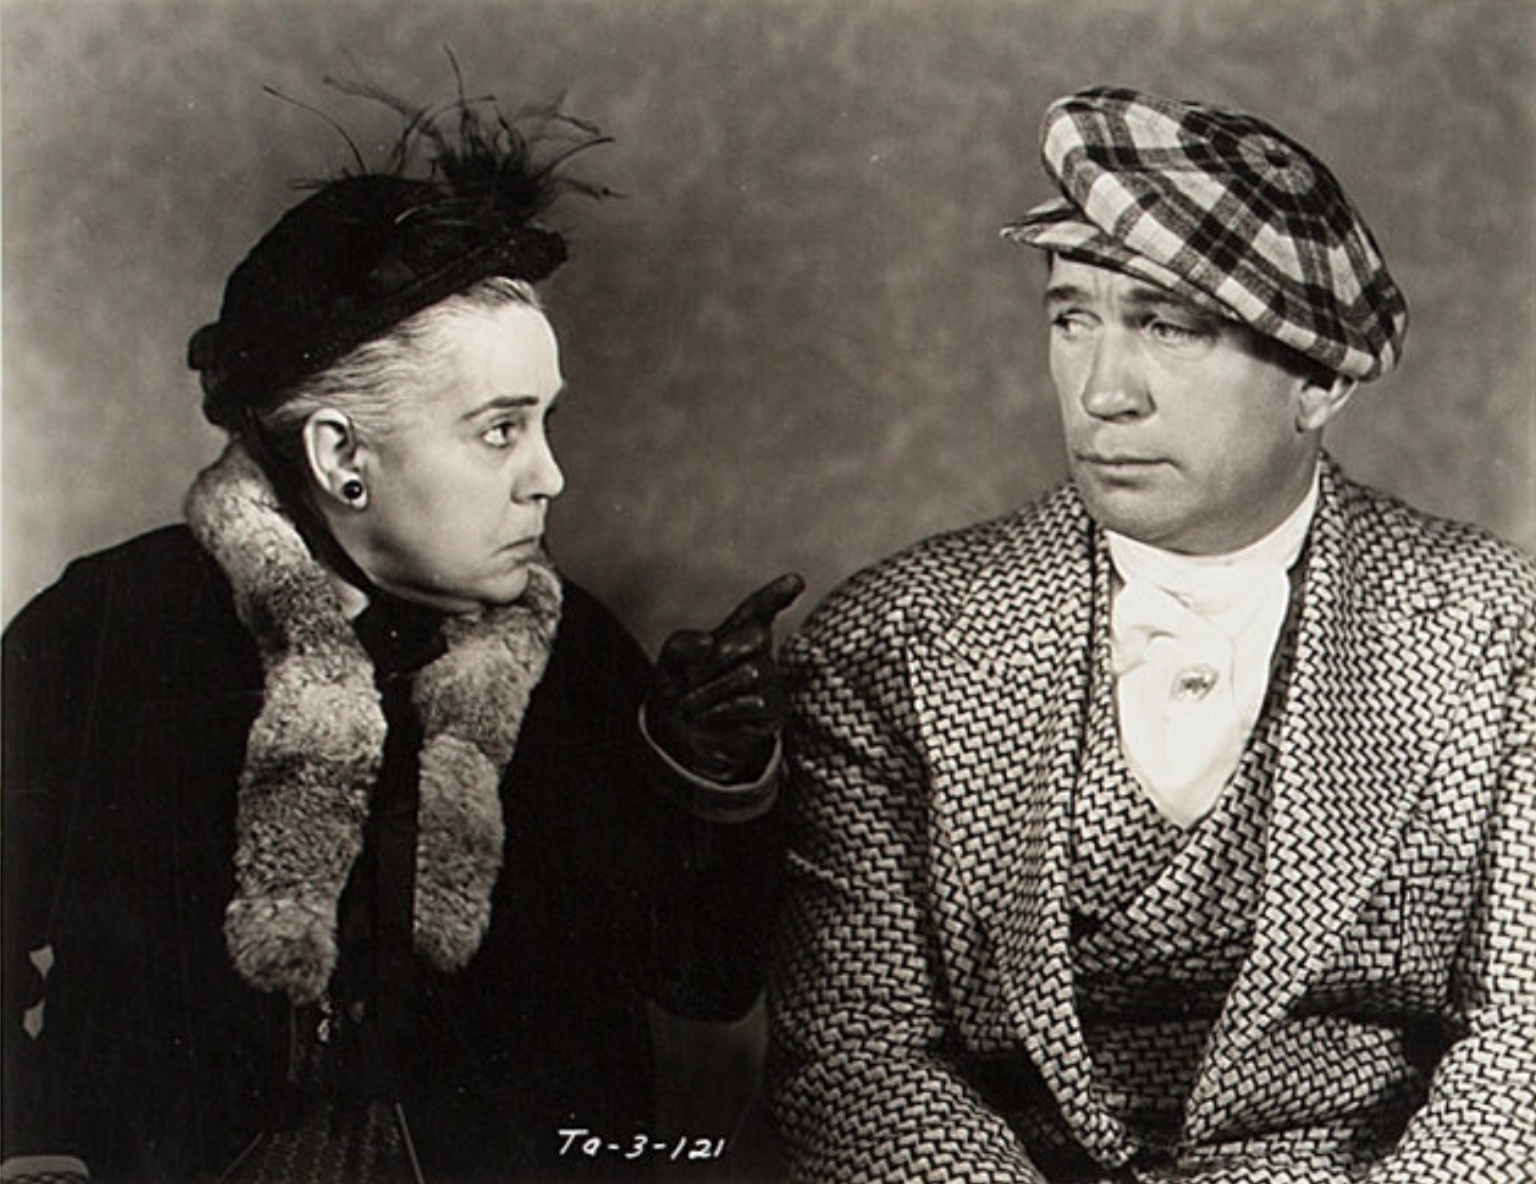 Victor McLaglen and Beryl Mercer in Devil's Lottery (1932)